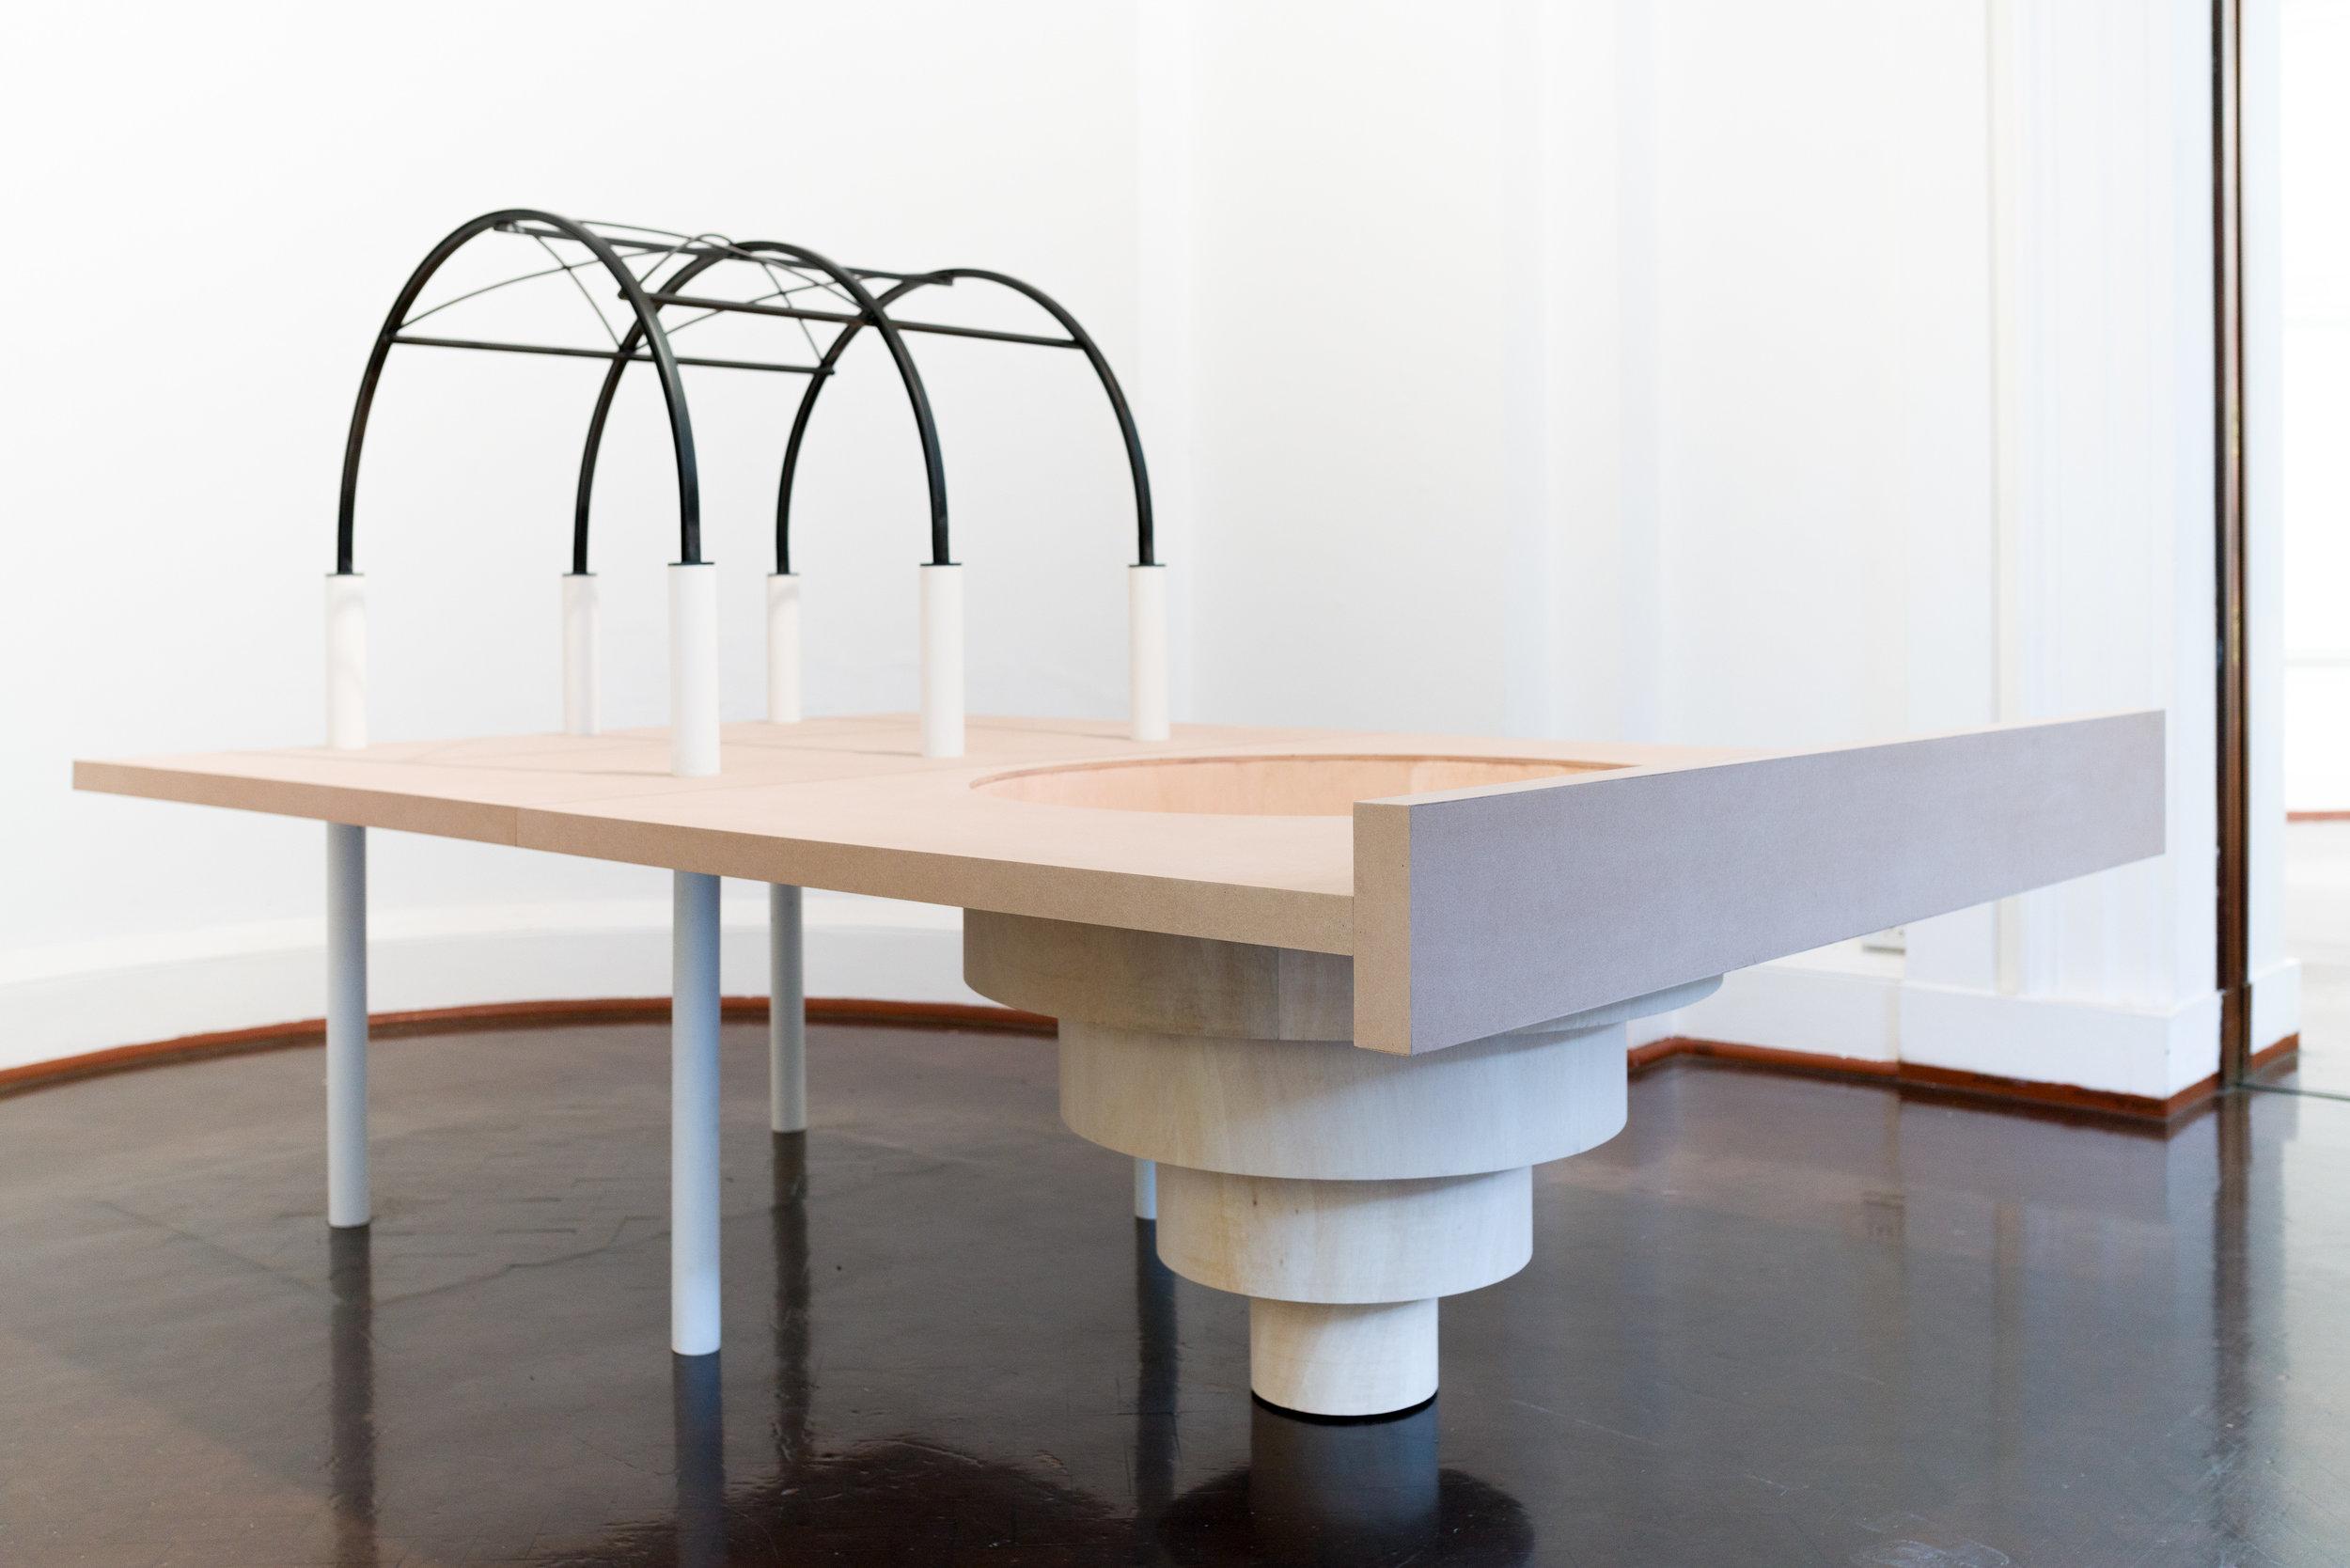 Ângela Ferreira, Remining (Vault table)